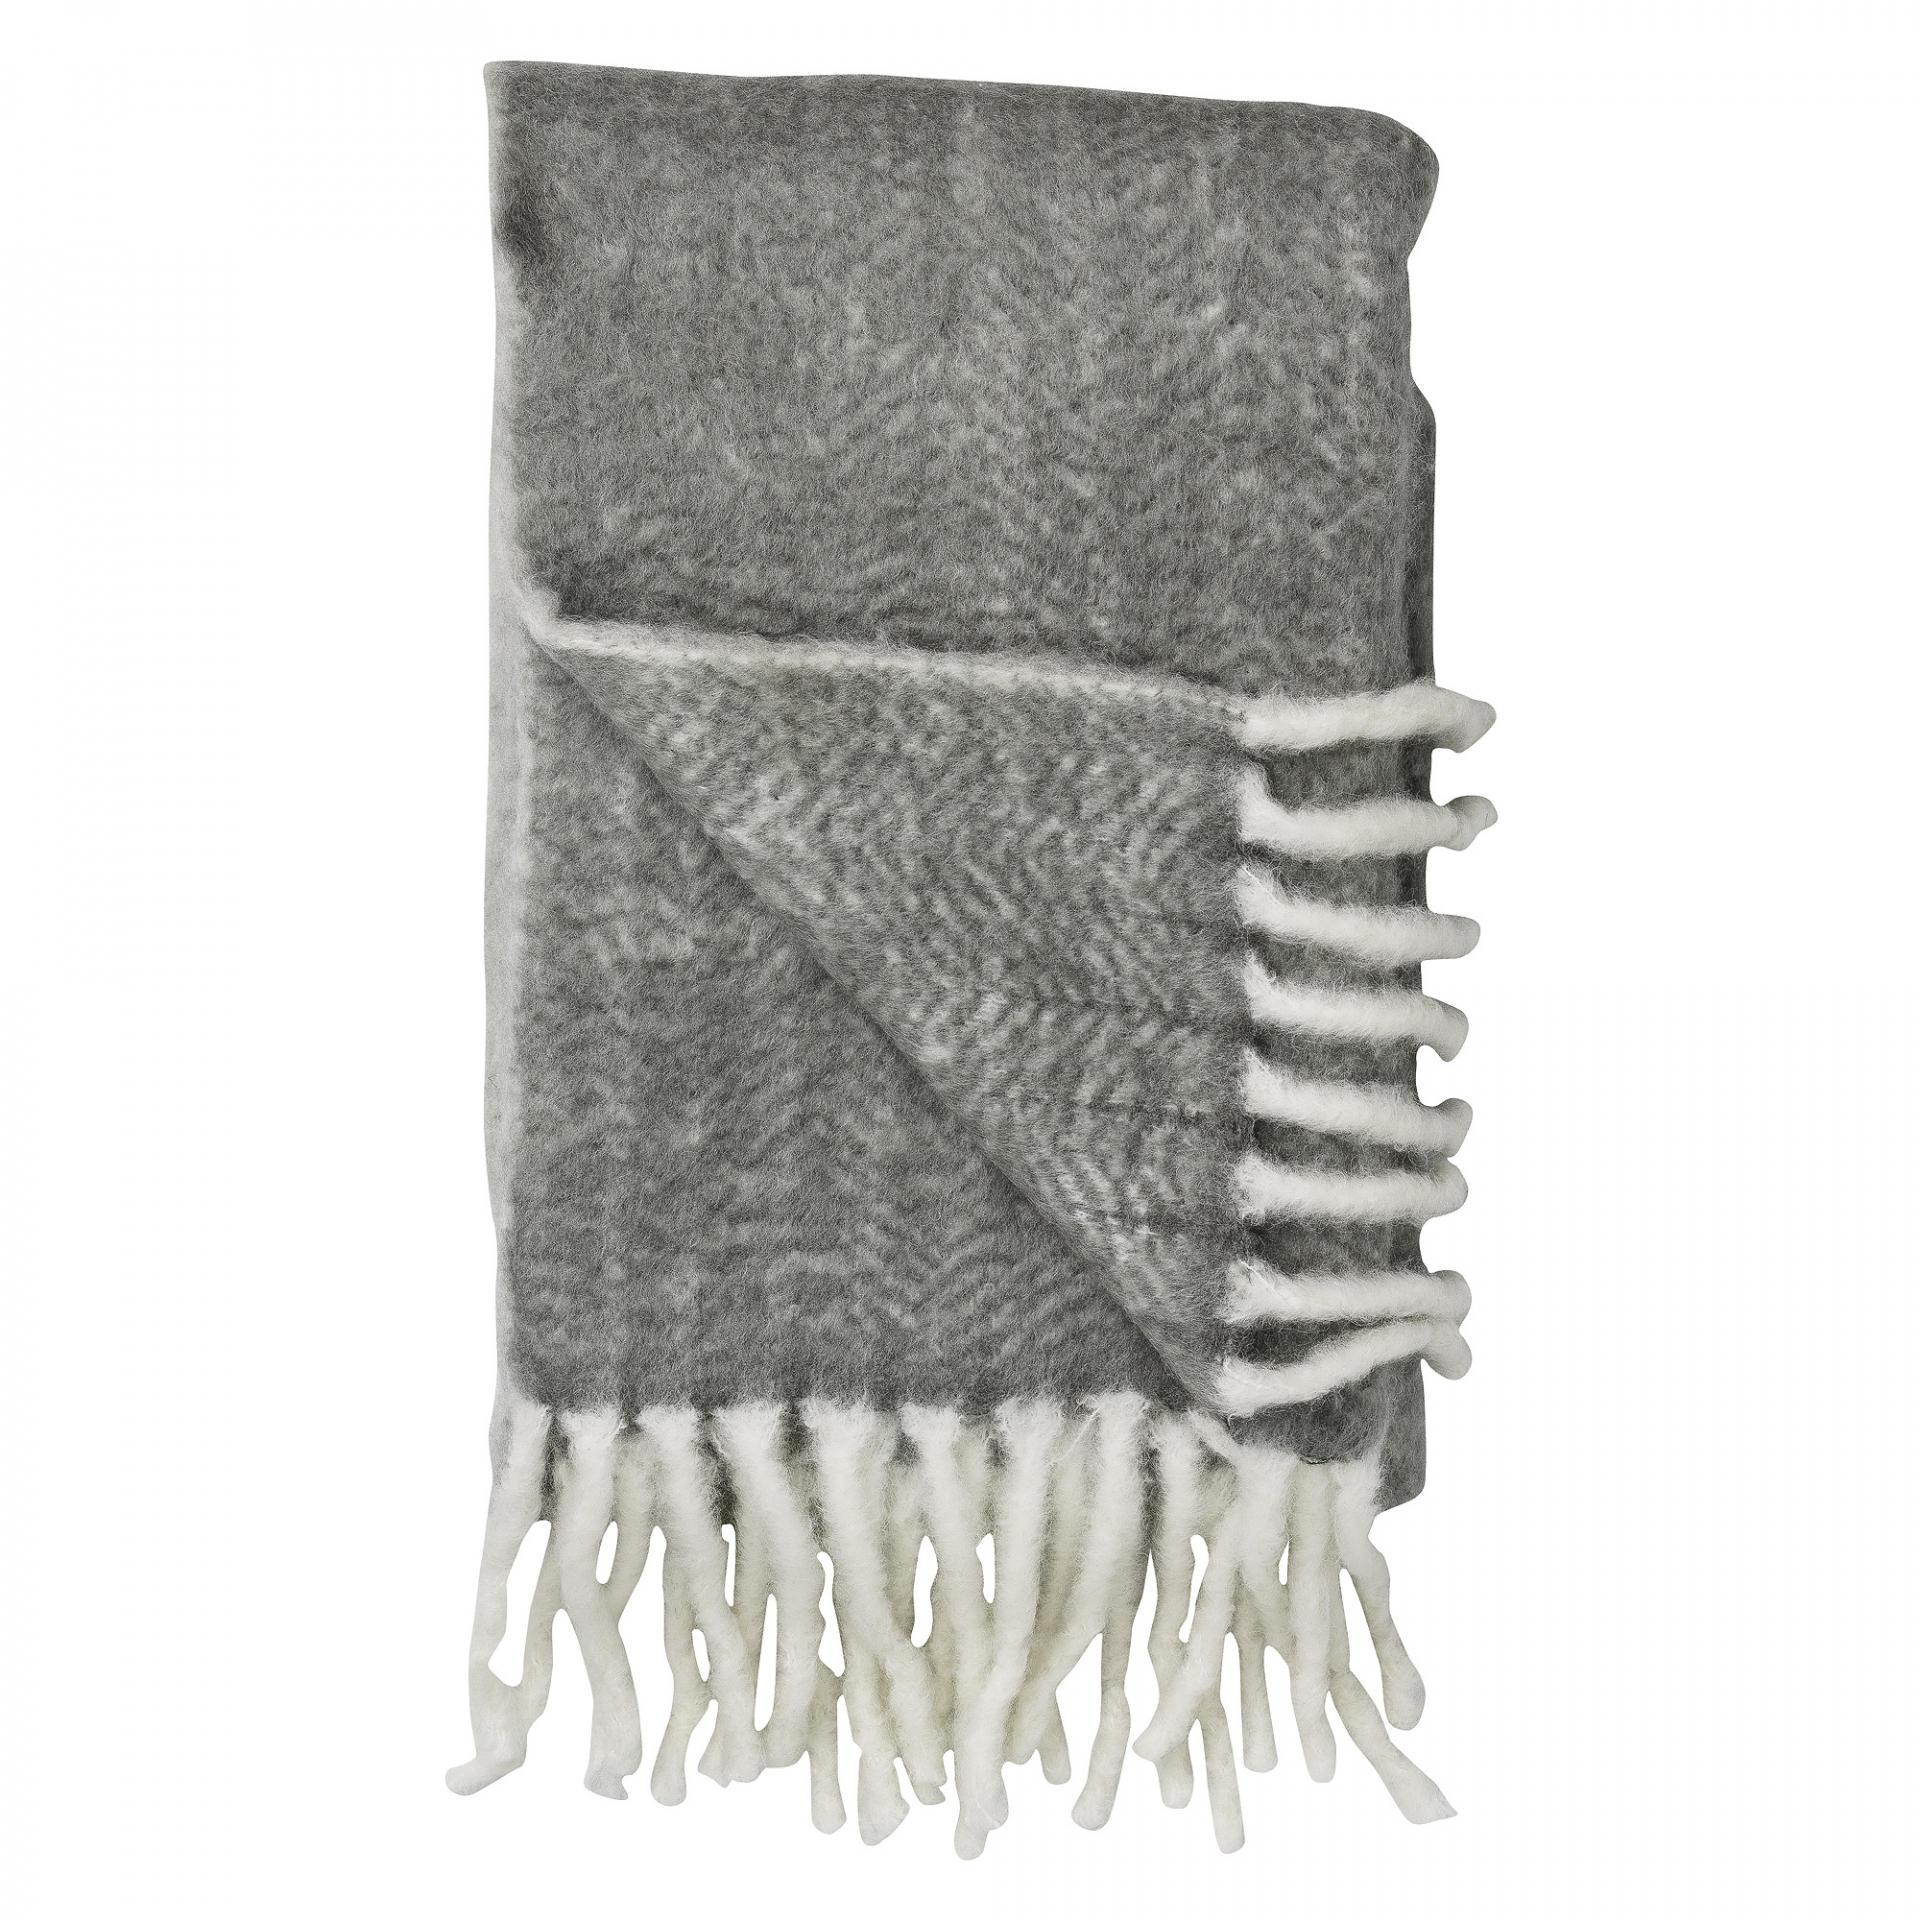 Bloomingville Pletený přehoz Grey&White, šedá barva, textil